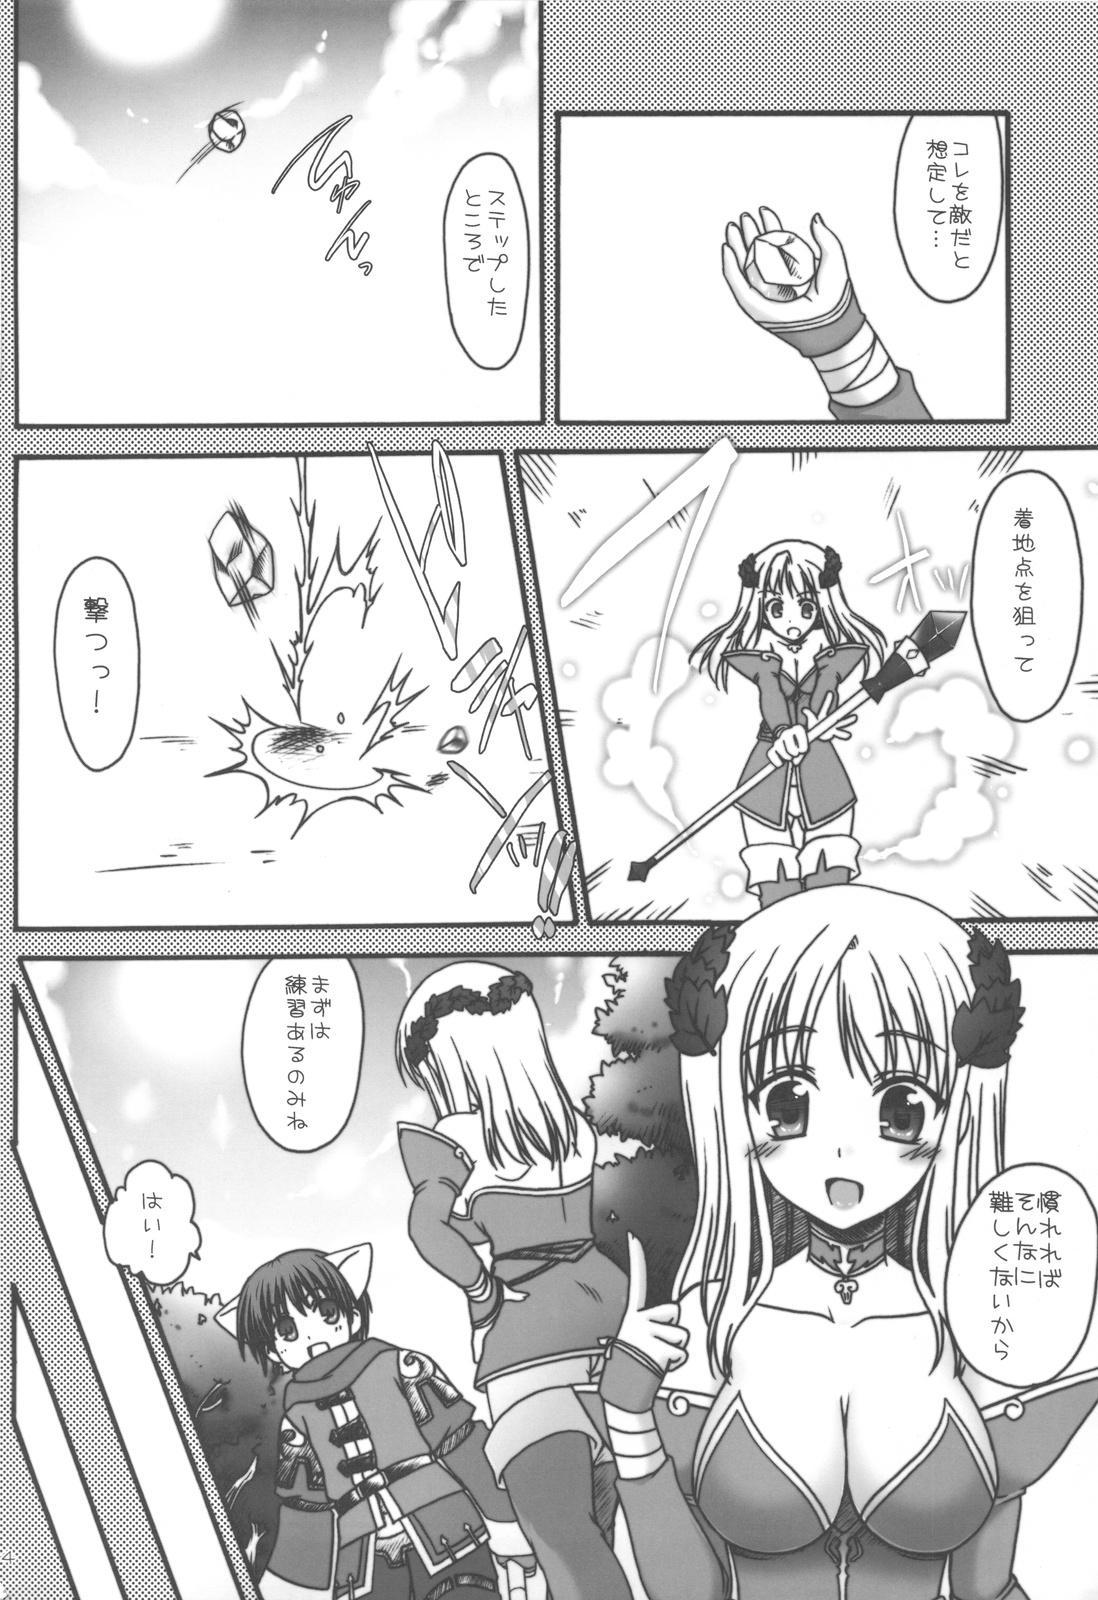 (C75) [Iiwake Gaisya (Shigemiya Kyouhei)] Koori Sara-san to Kaminari Sara-kun. (Fantasy Earth Zero) 2